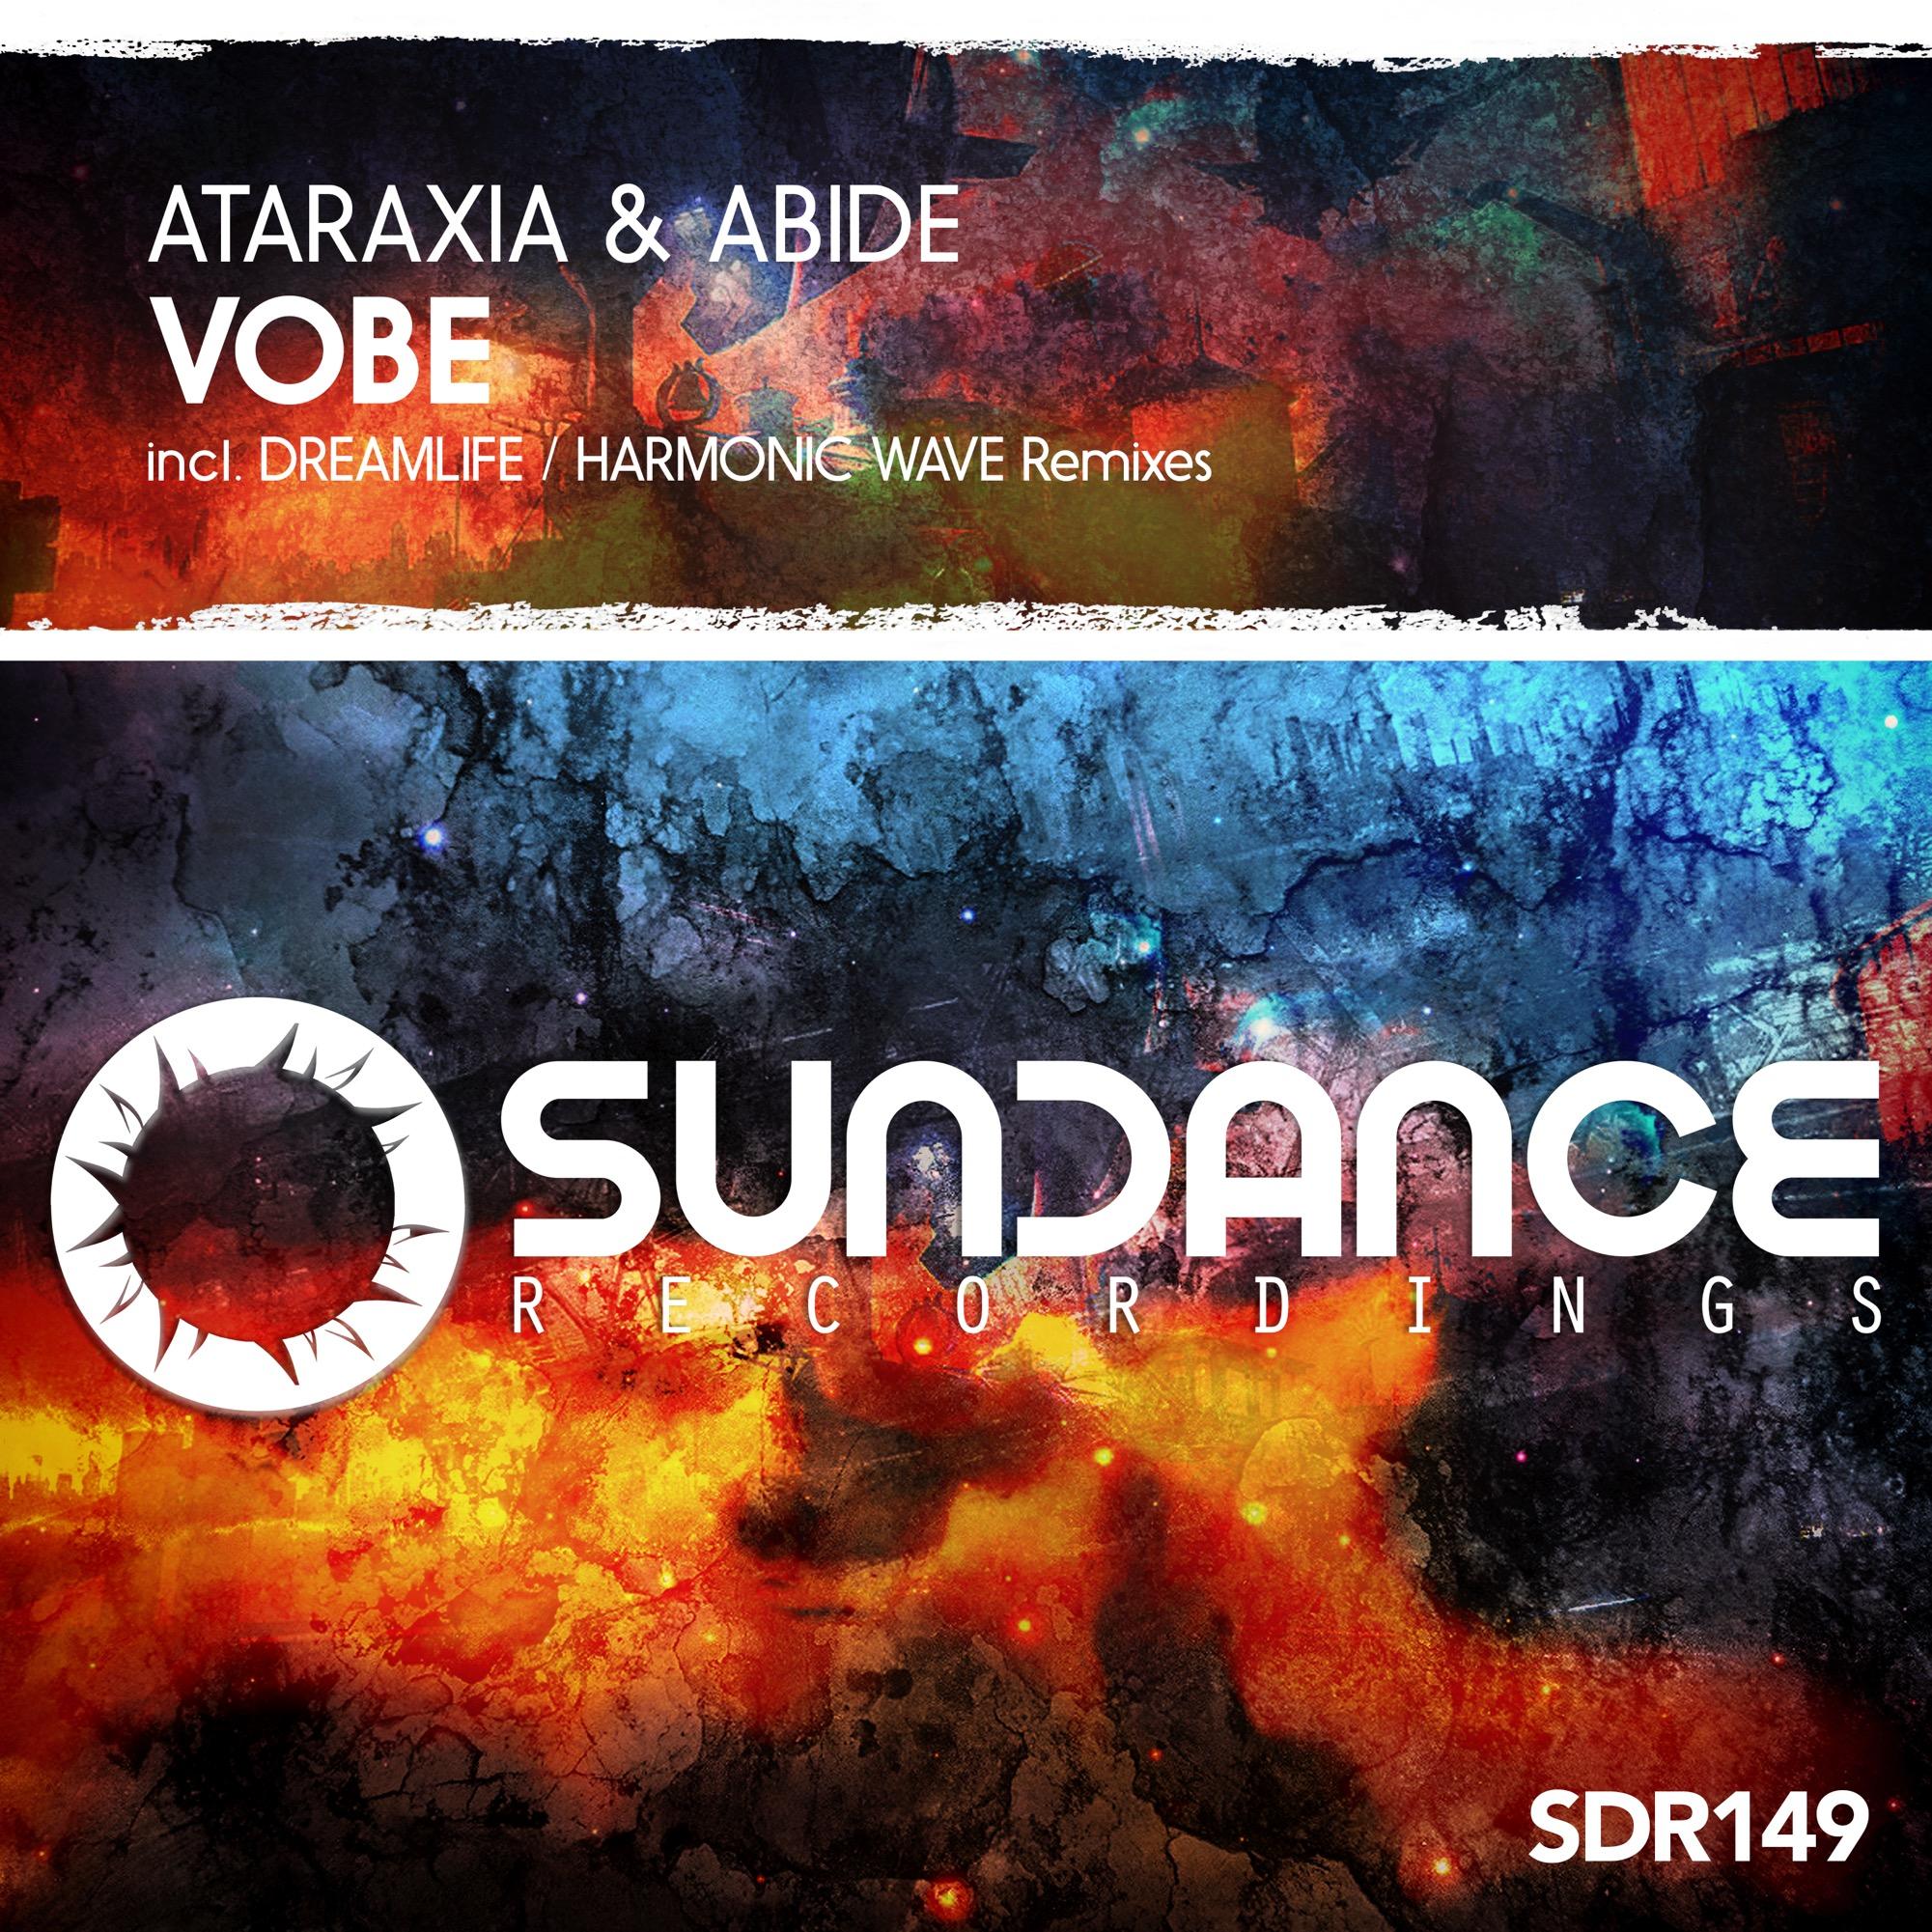 Ataraxia & Abide – Vobe (DreamLife Remix)